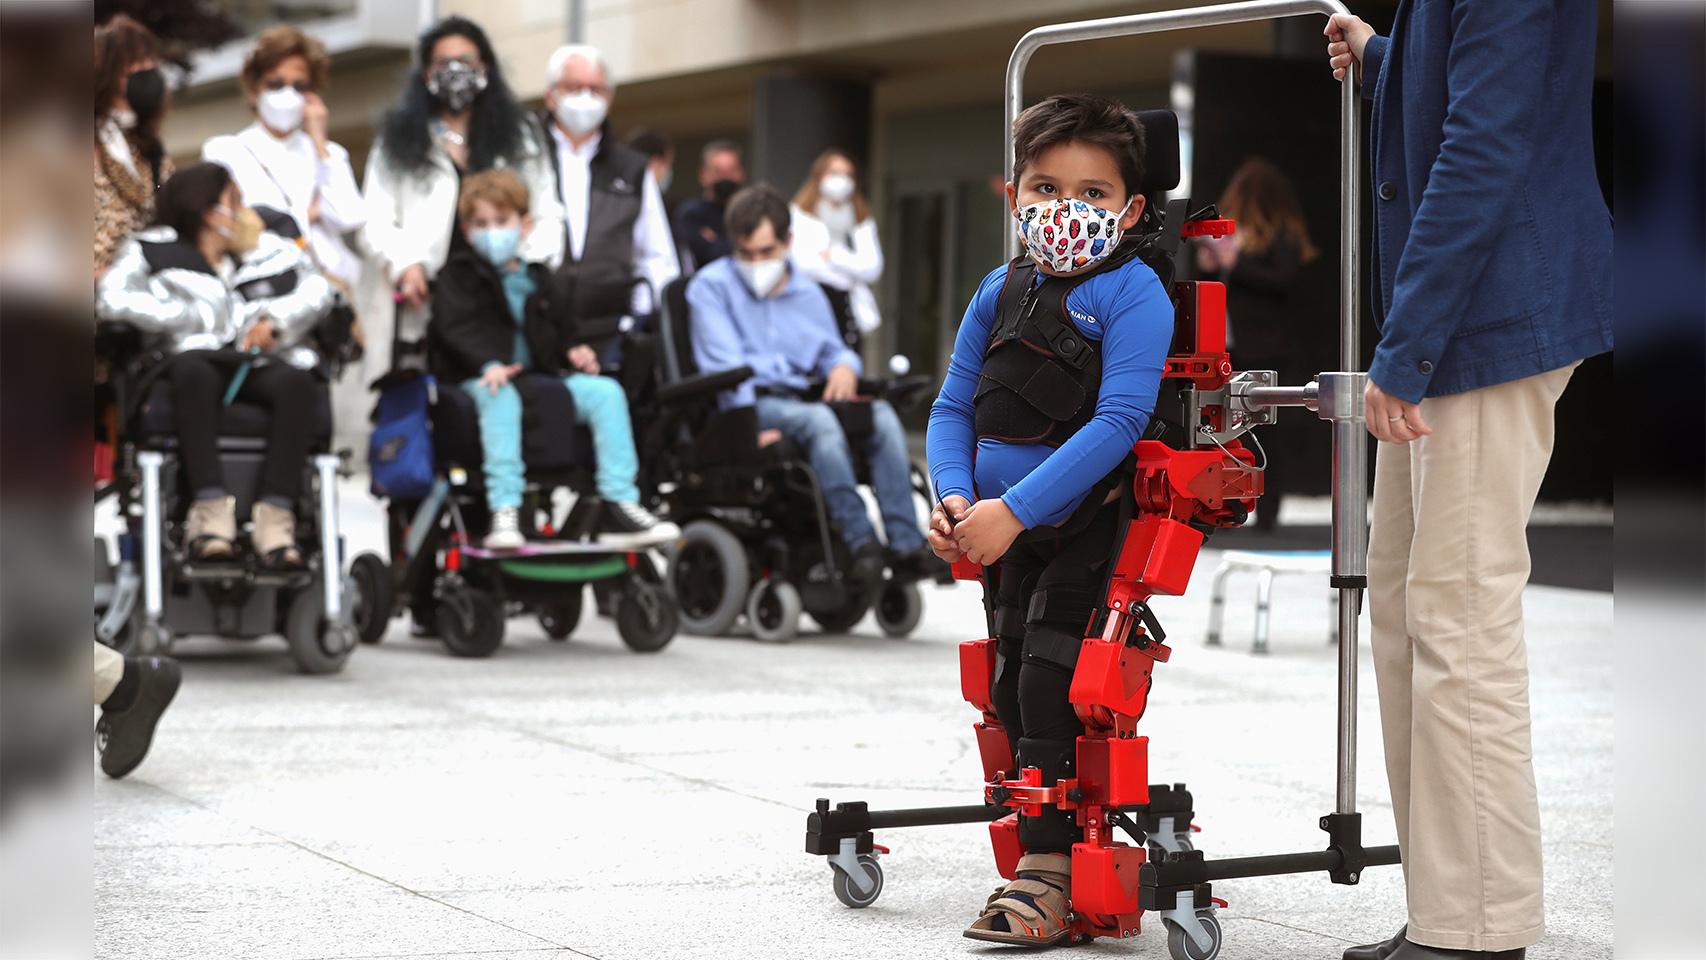 El exoesqueleto pediátrico.